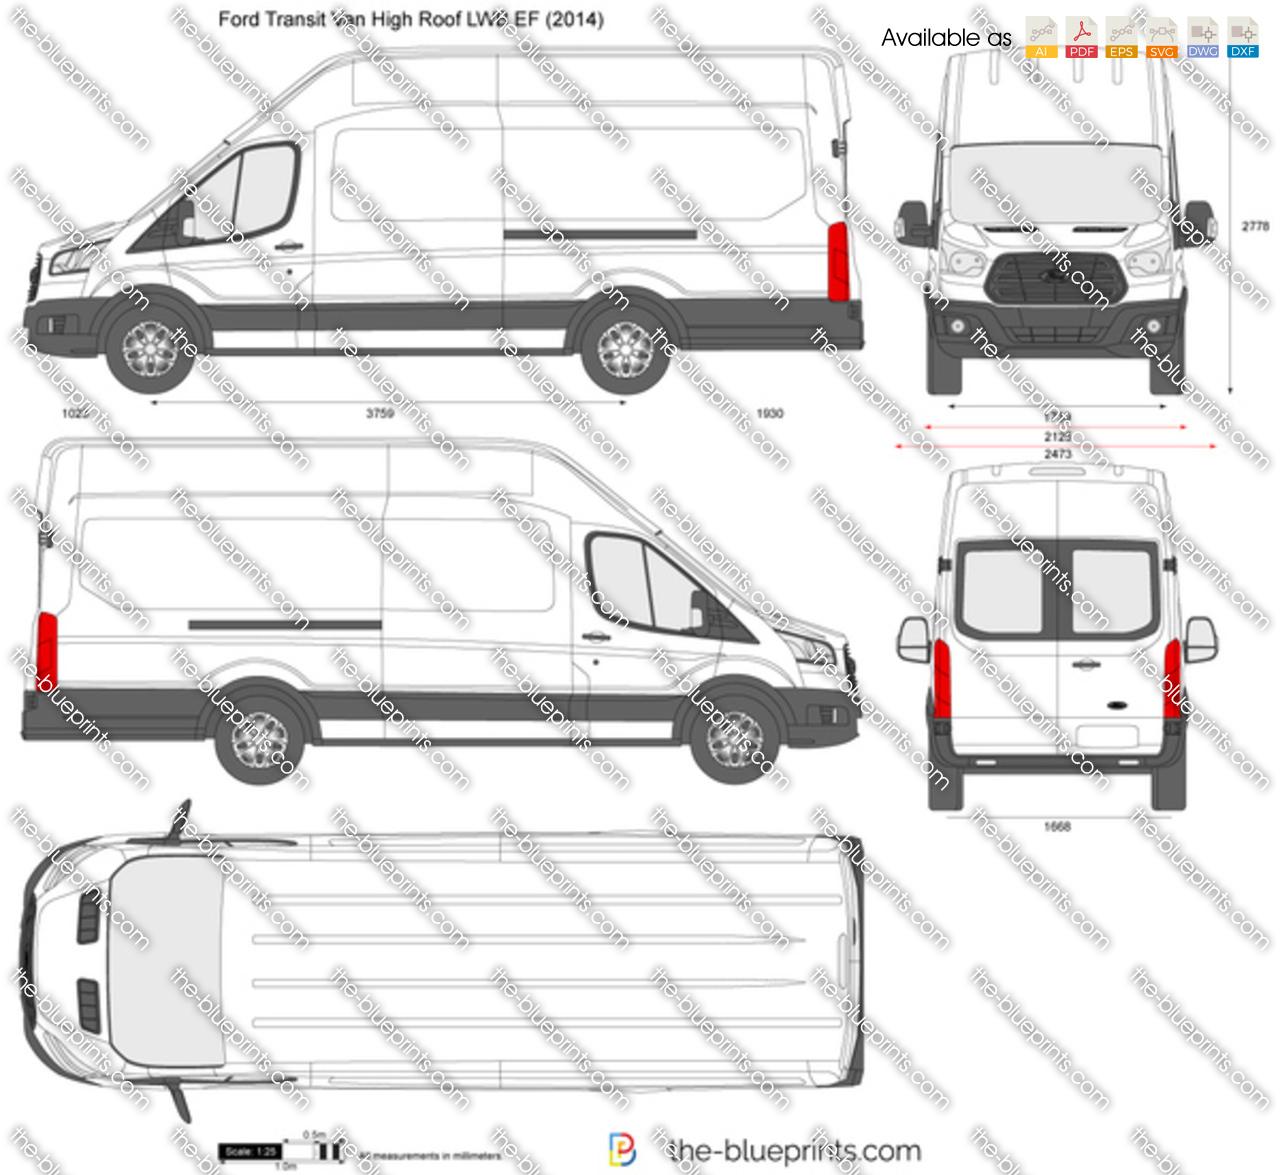 Ford Transit Van High Roof Lwb Ef Vector Drawing